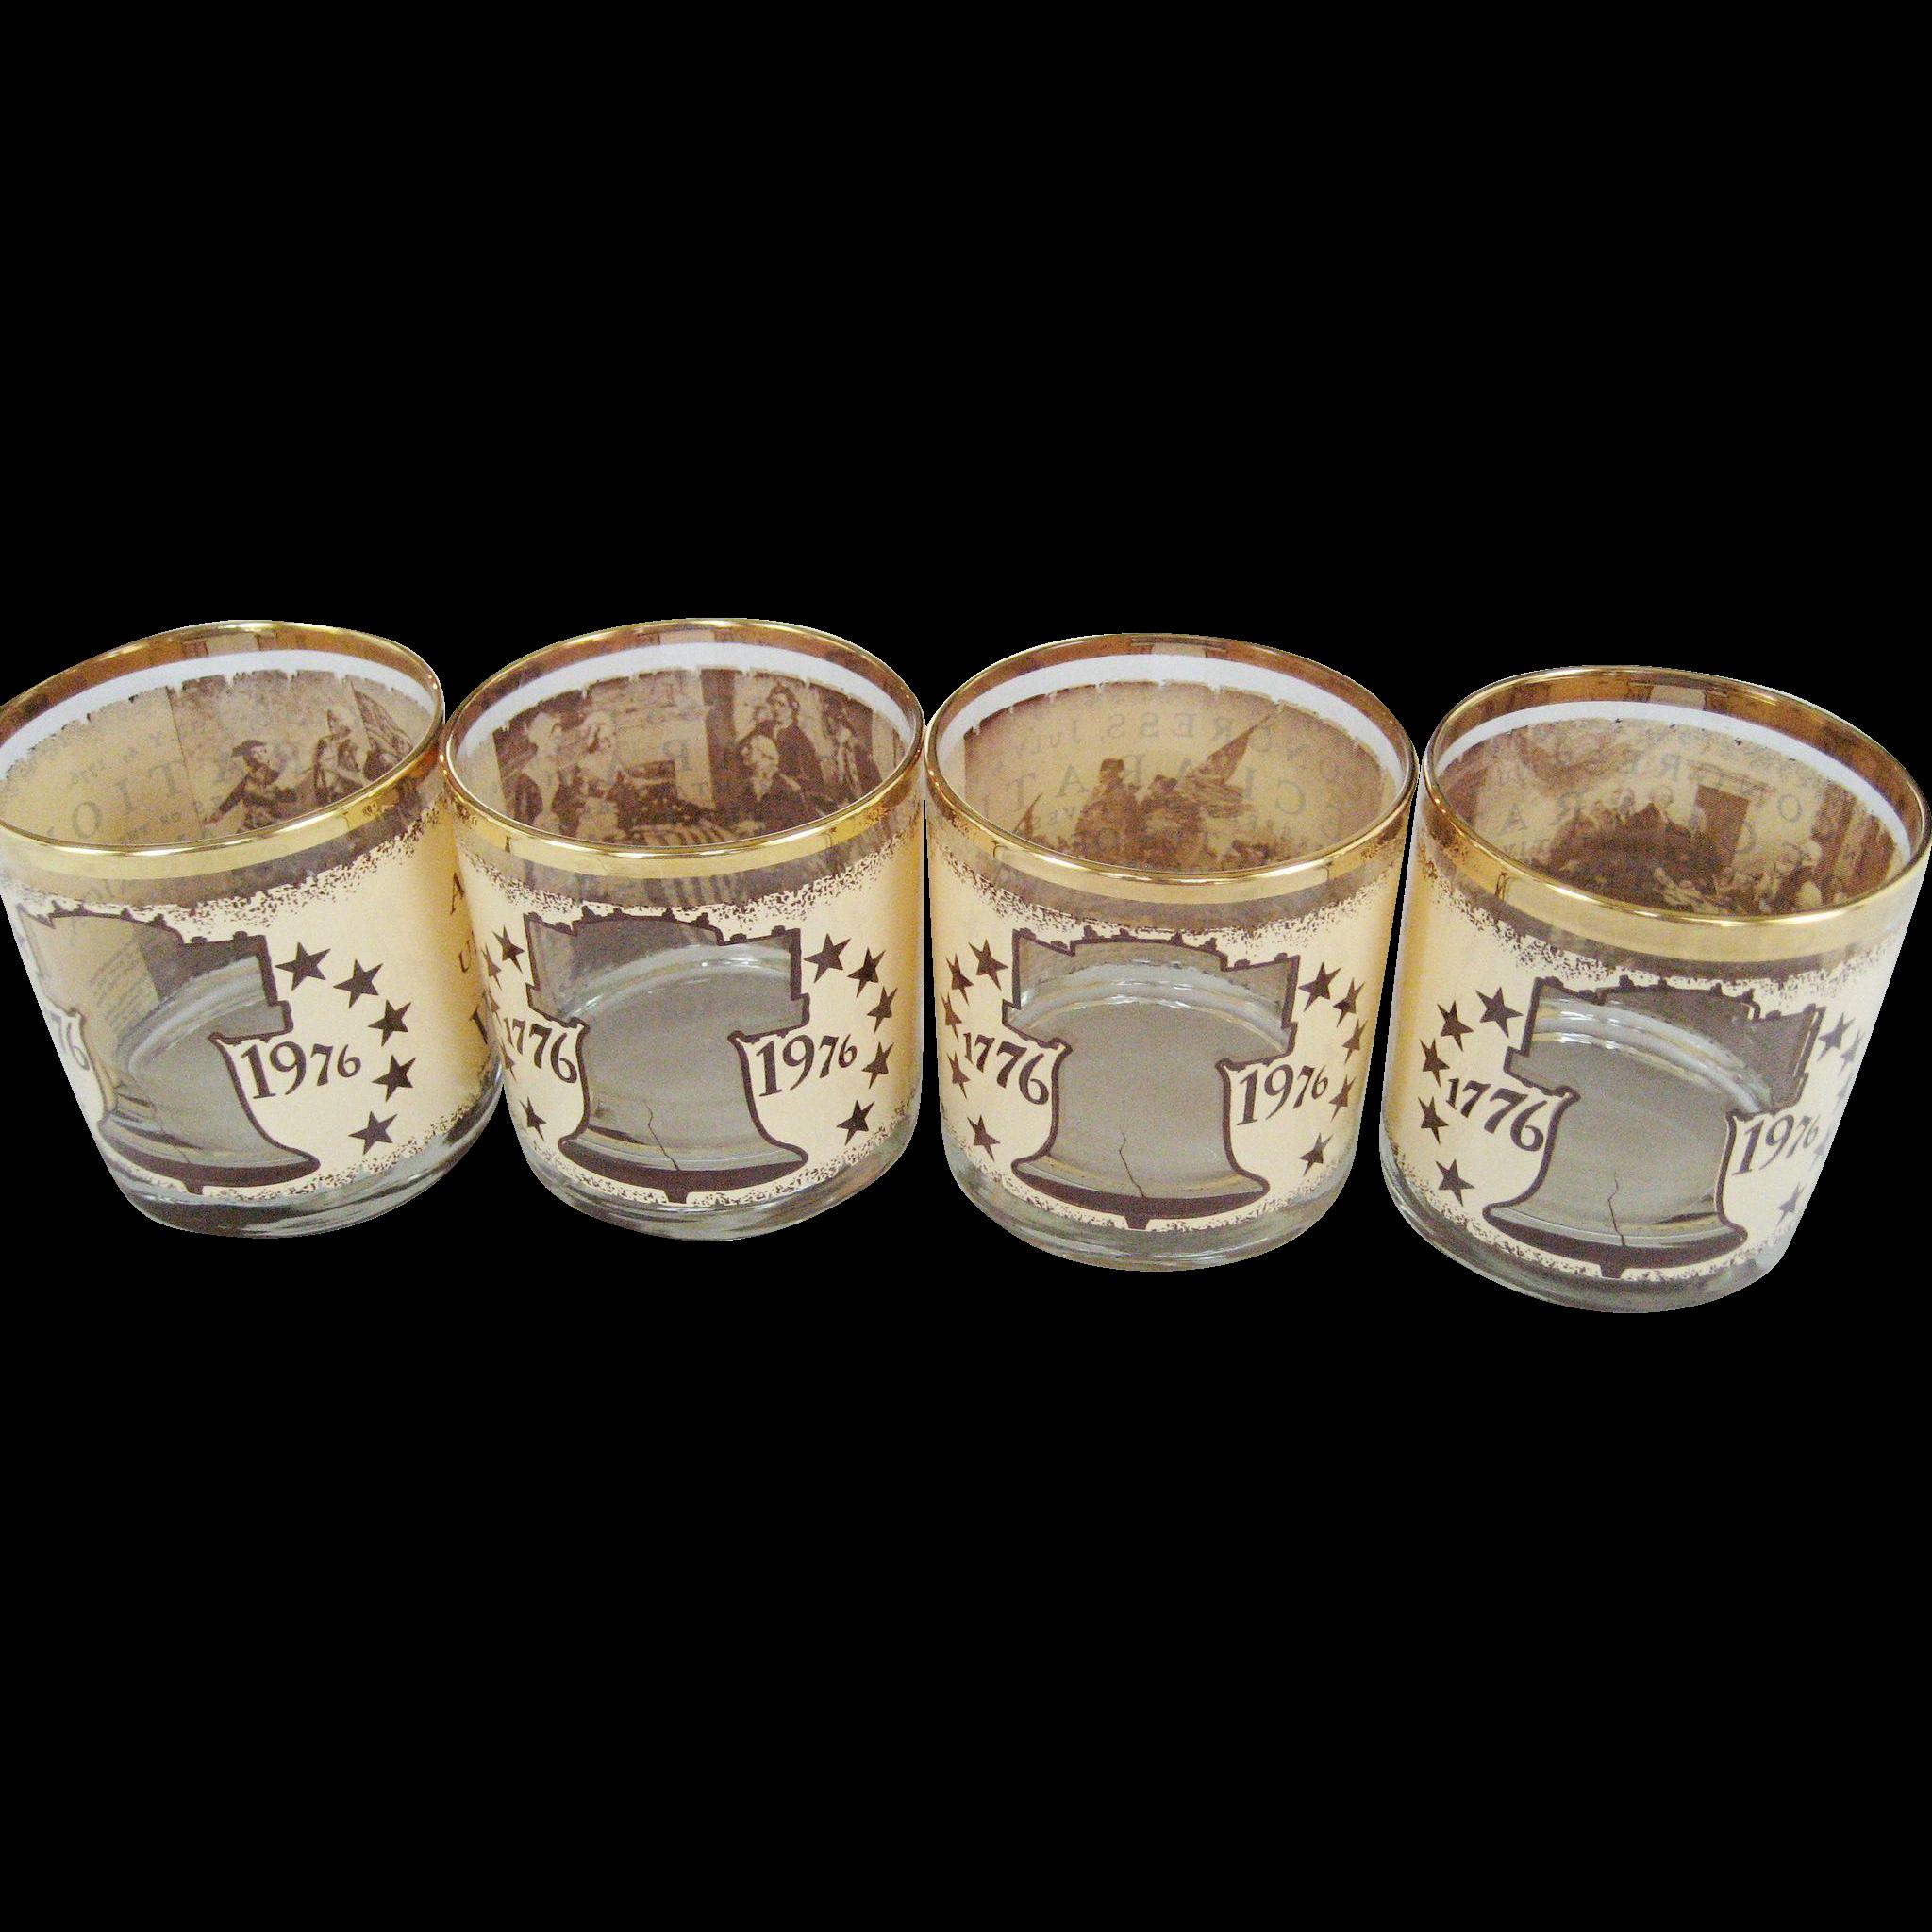 Set of 4 Bi-Centennial Old Fashion Glasses